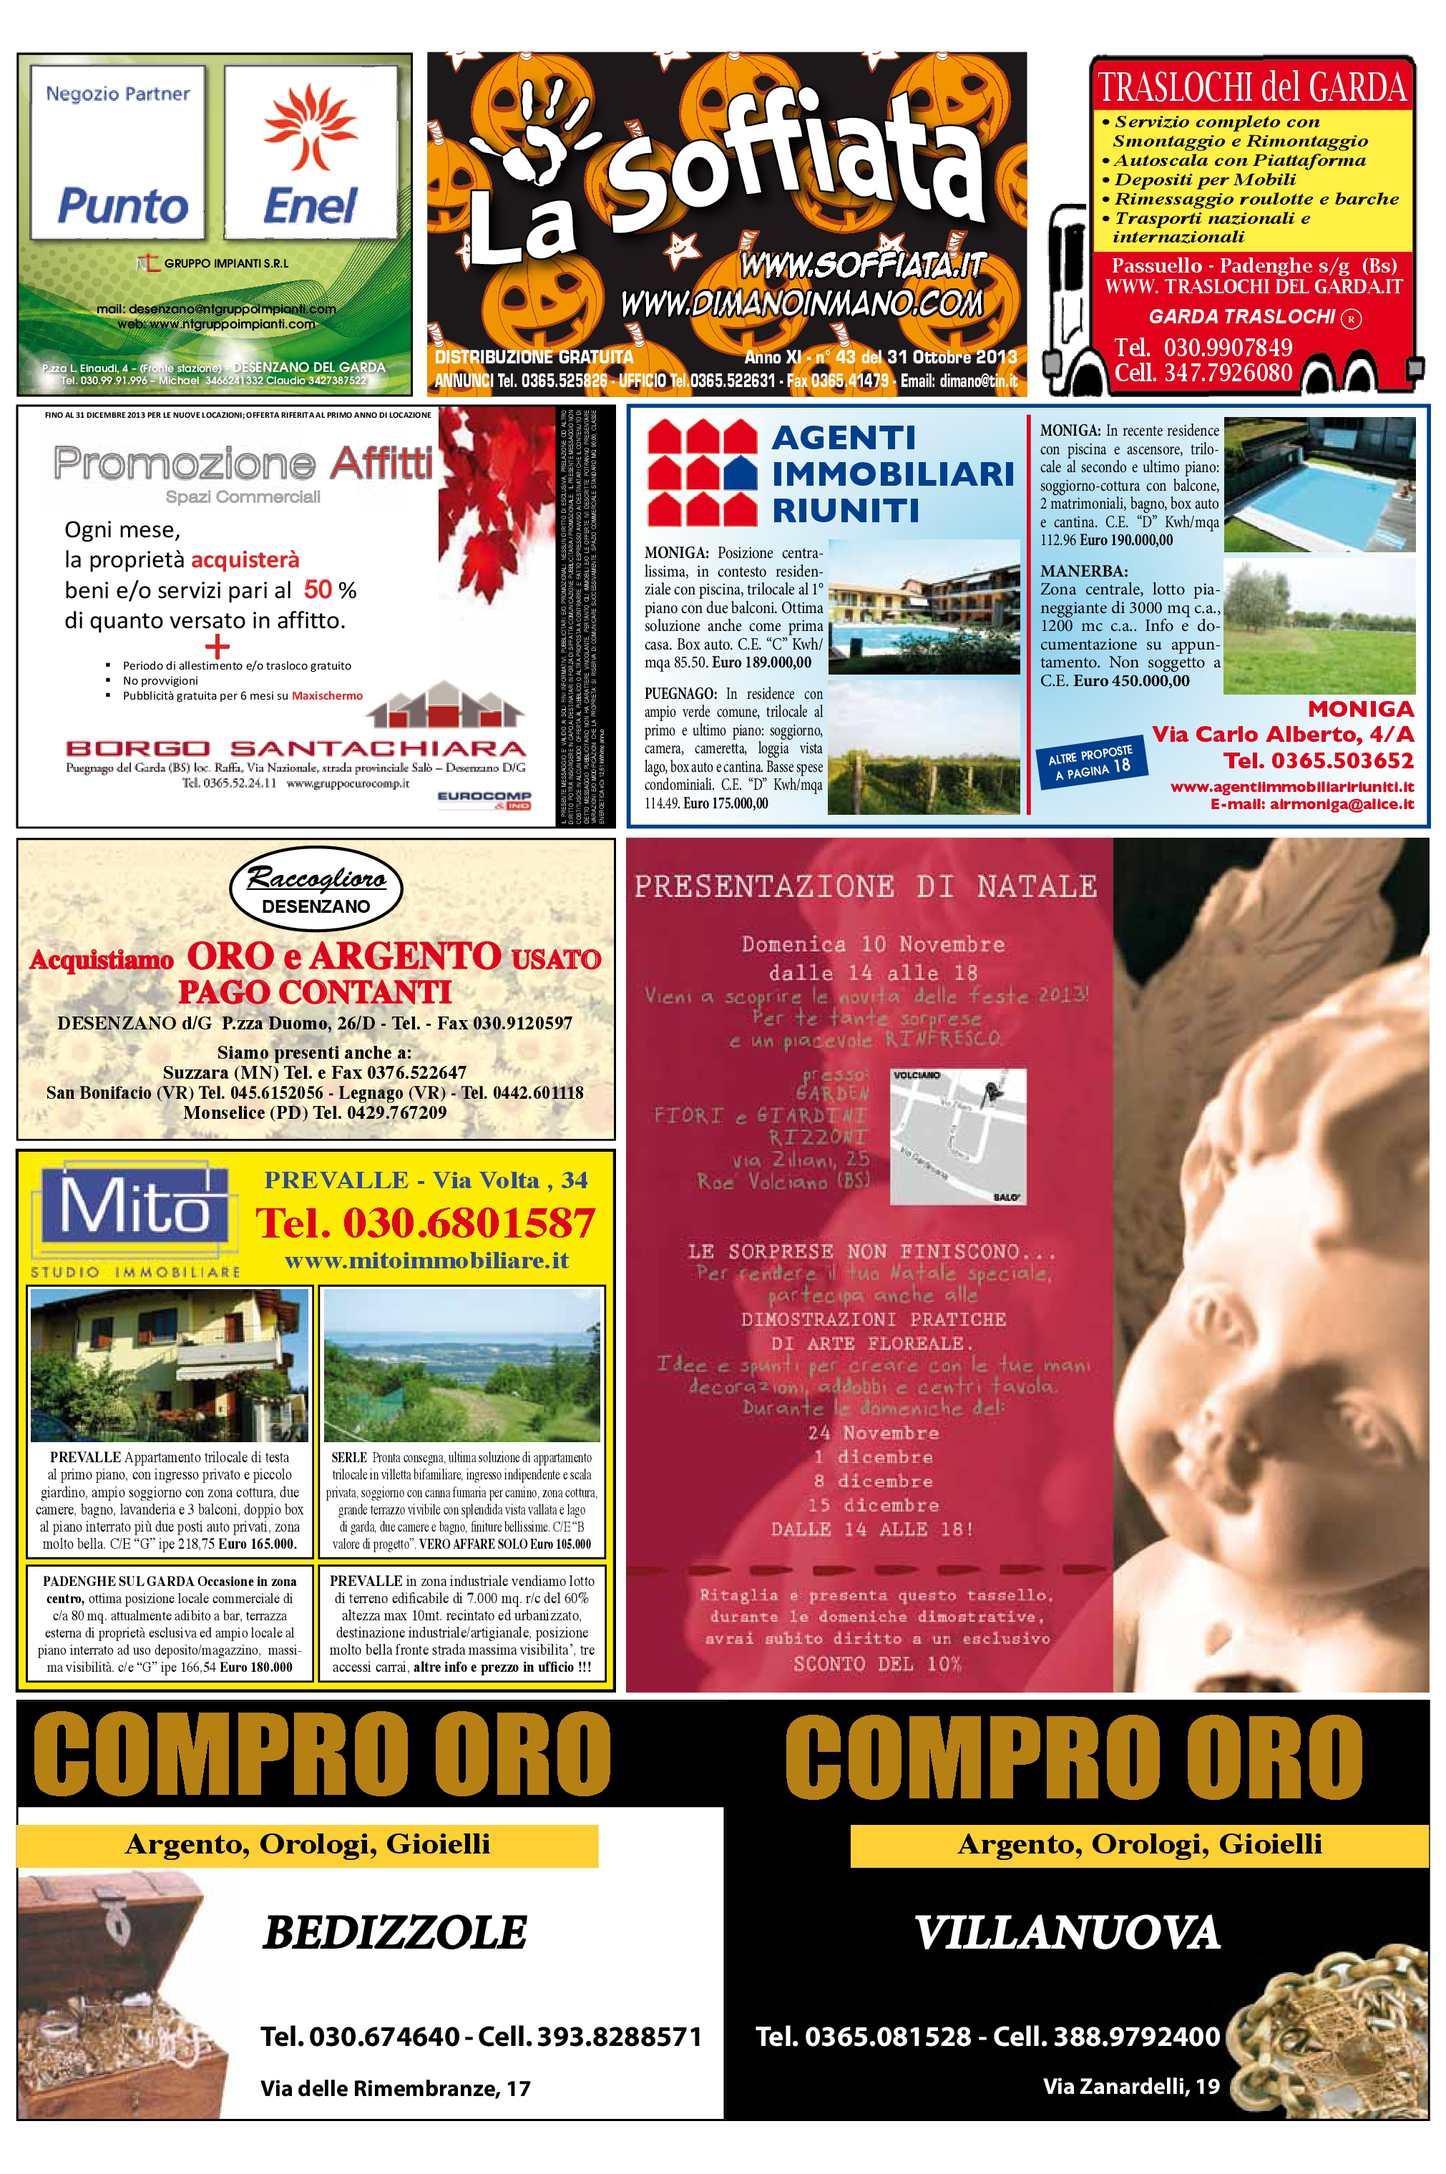 Calaméo - La Soffiata 31-10-2013 bf40061135db